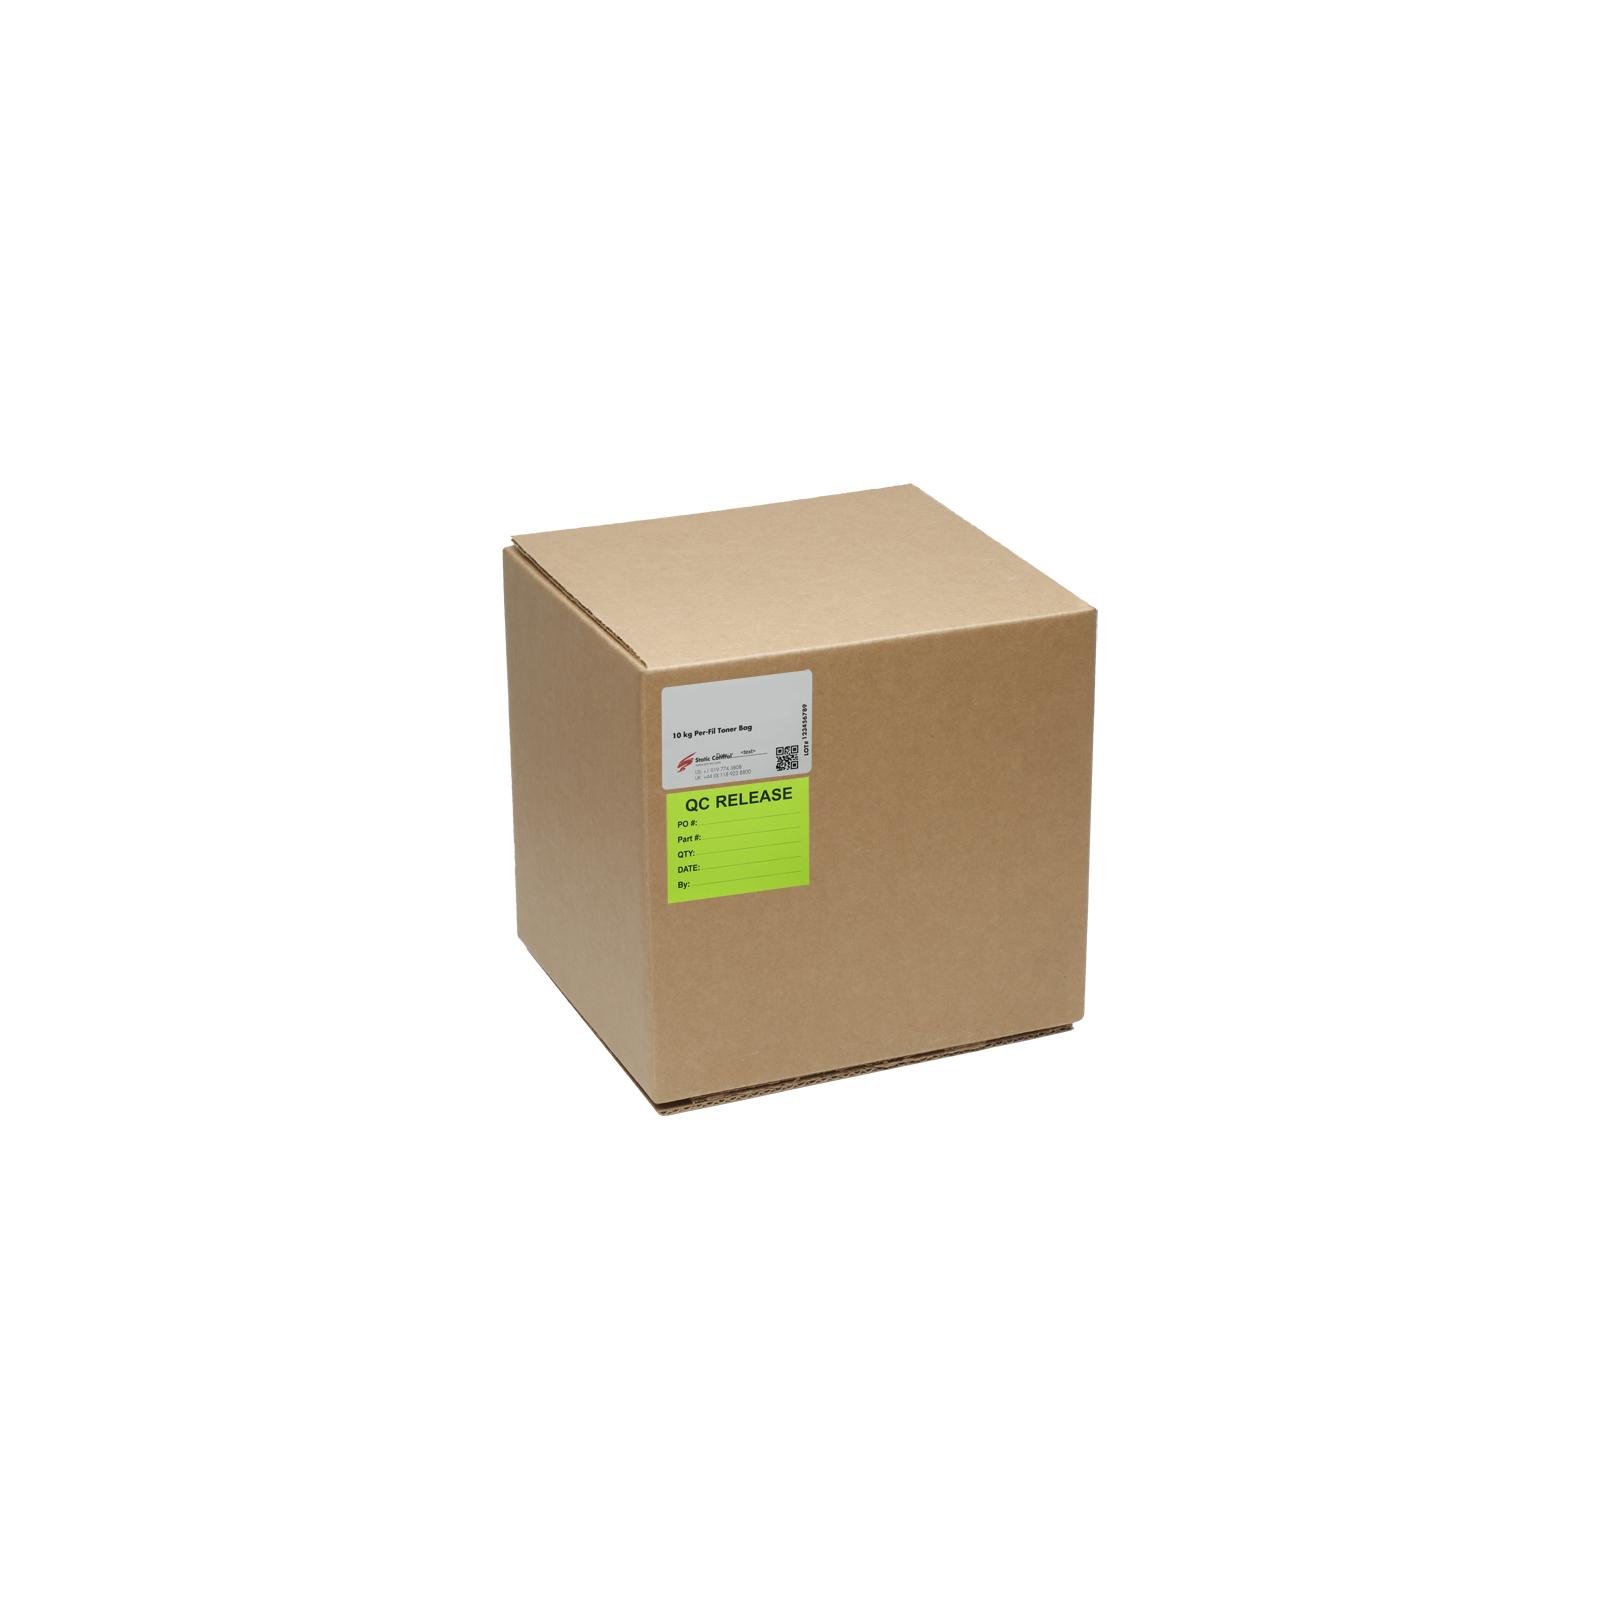 Тонер HP CLJ ProM452 10кг сyan Static Control (HM452-10KG-COS)